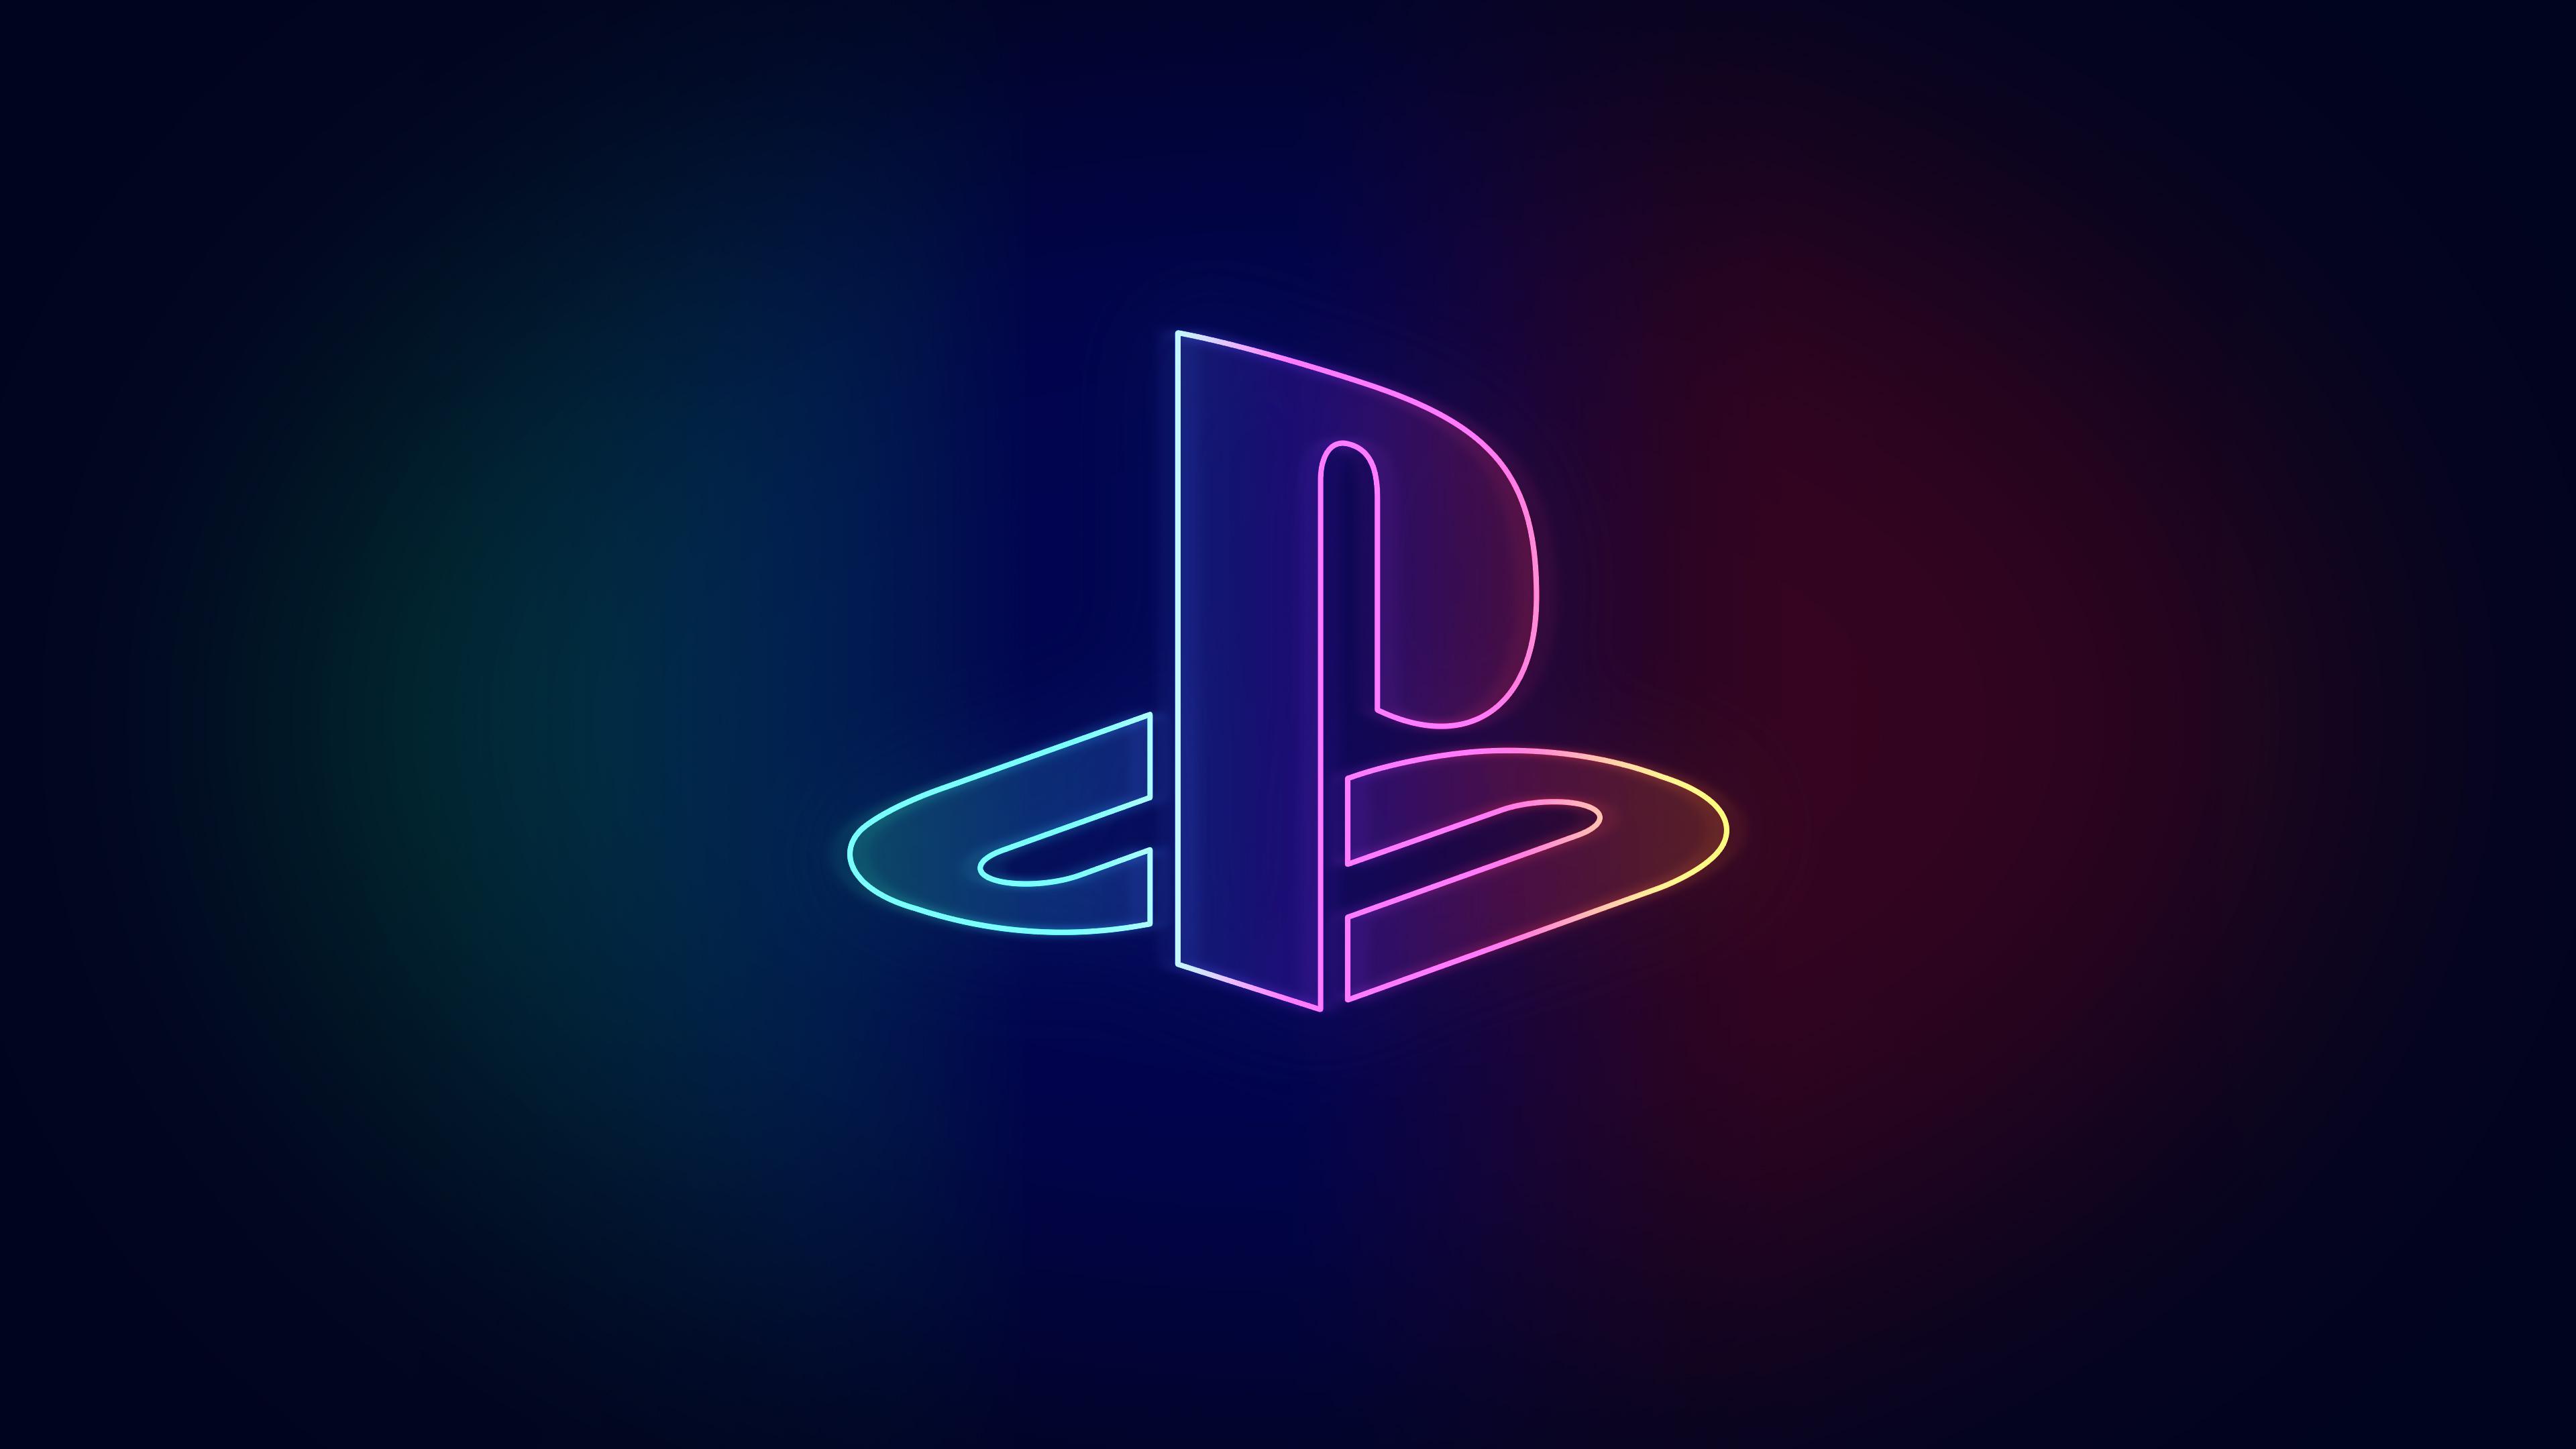 Neon Playstation wallpaper [3840 x 2160] playstation 3840x2160